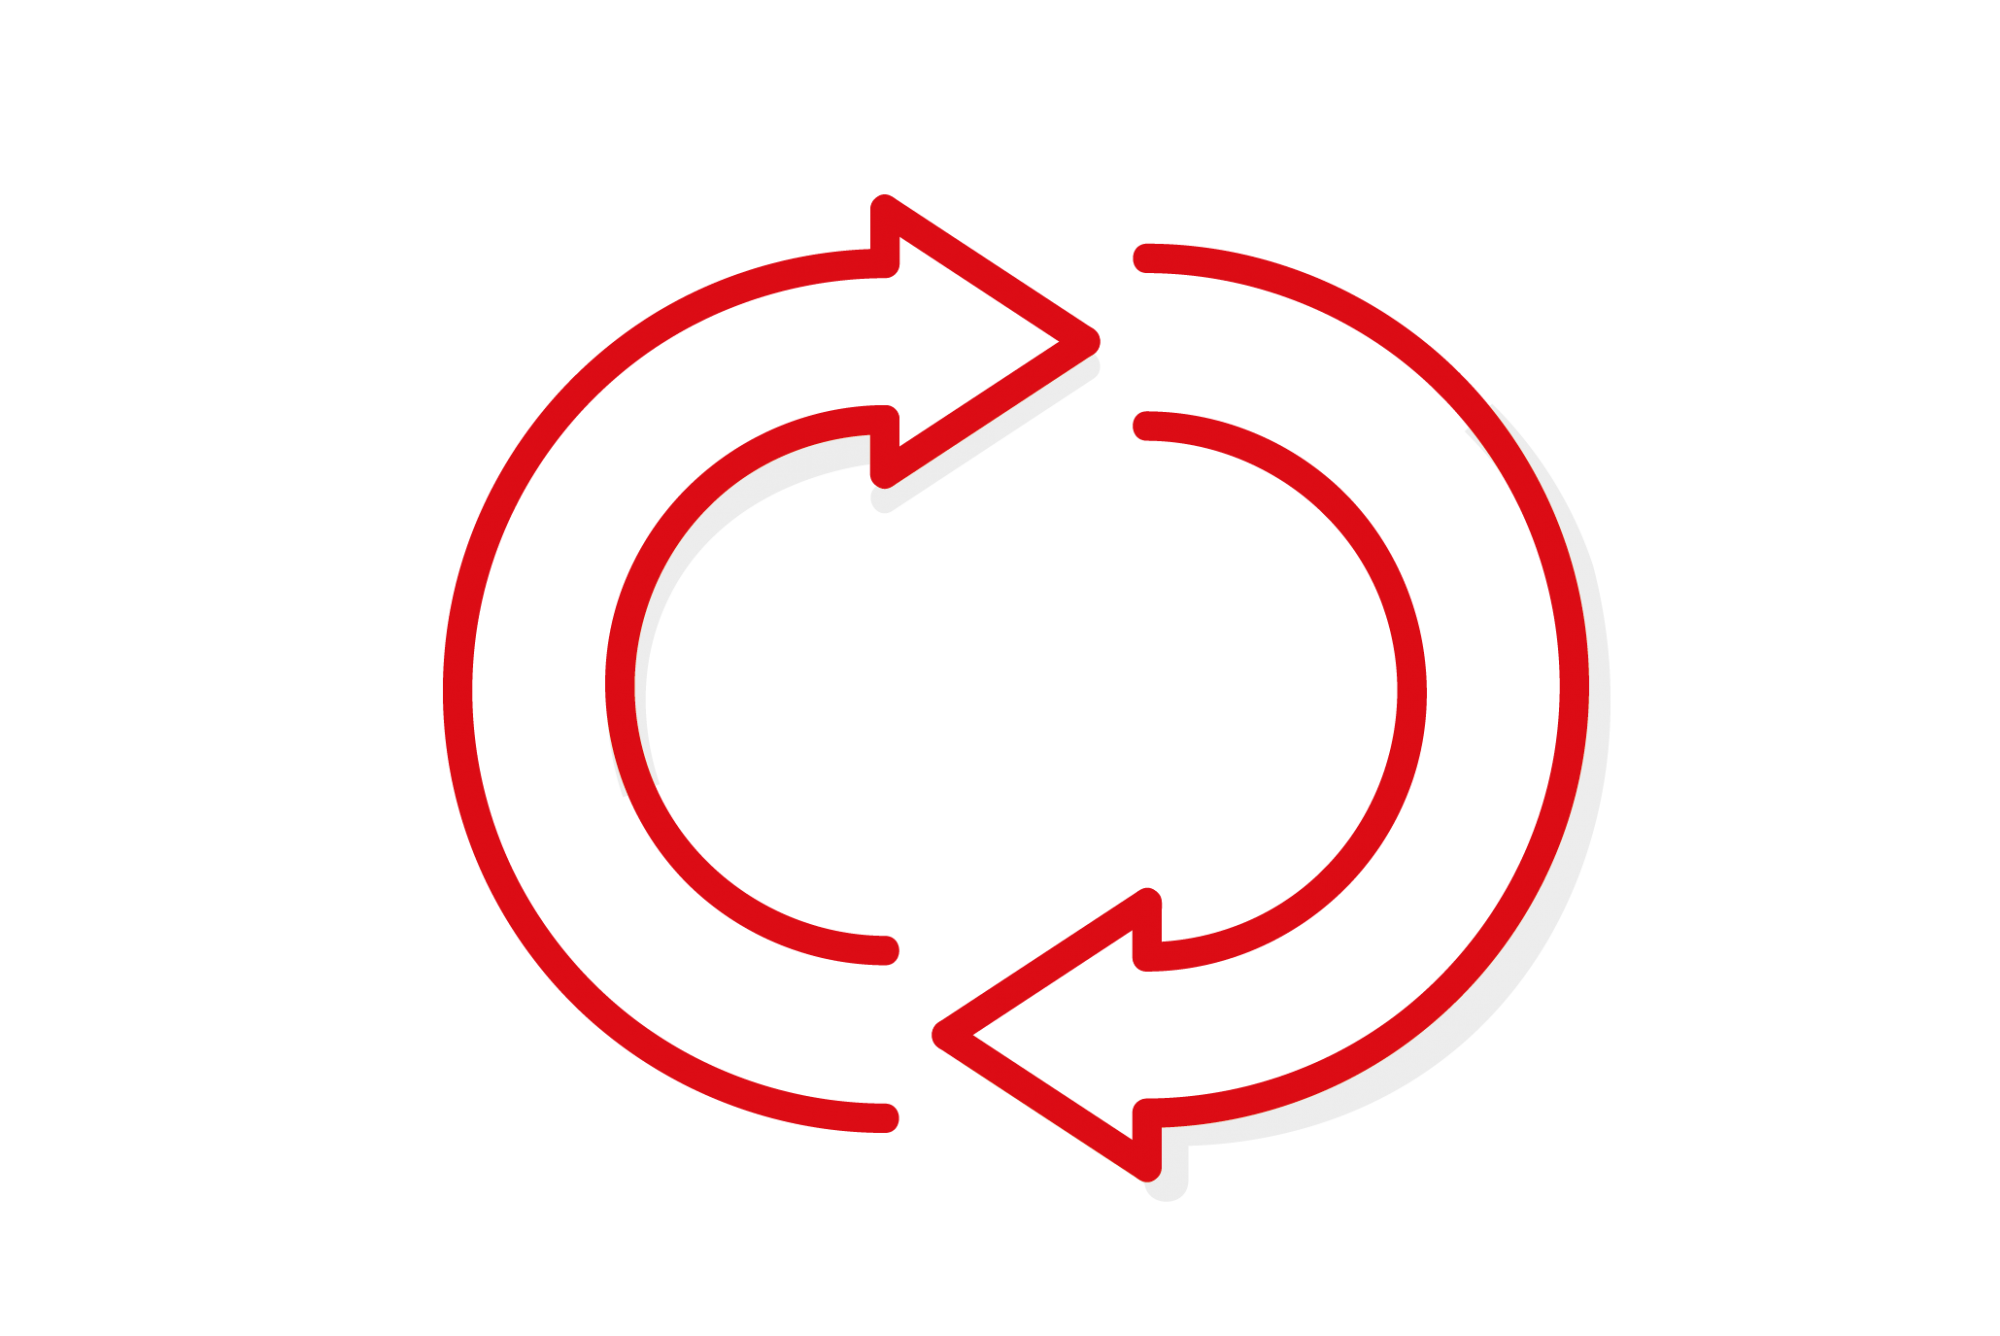 Red loop illustration